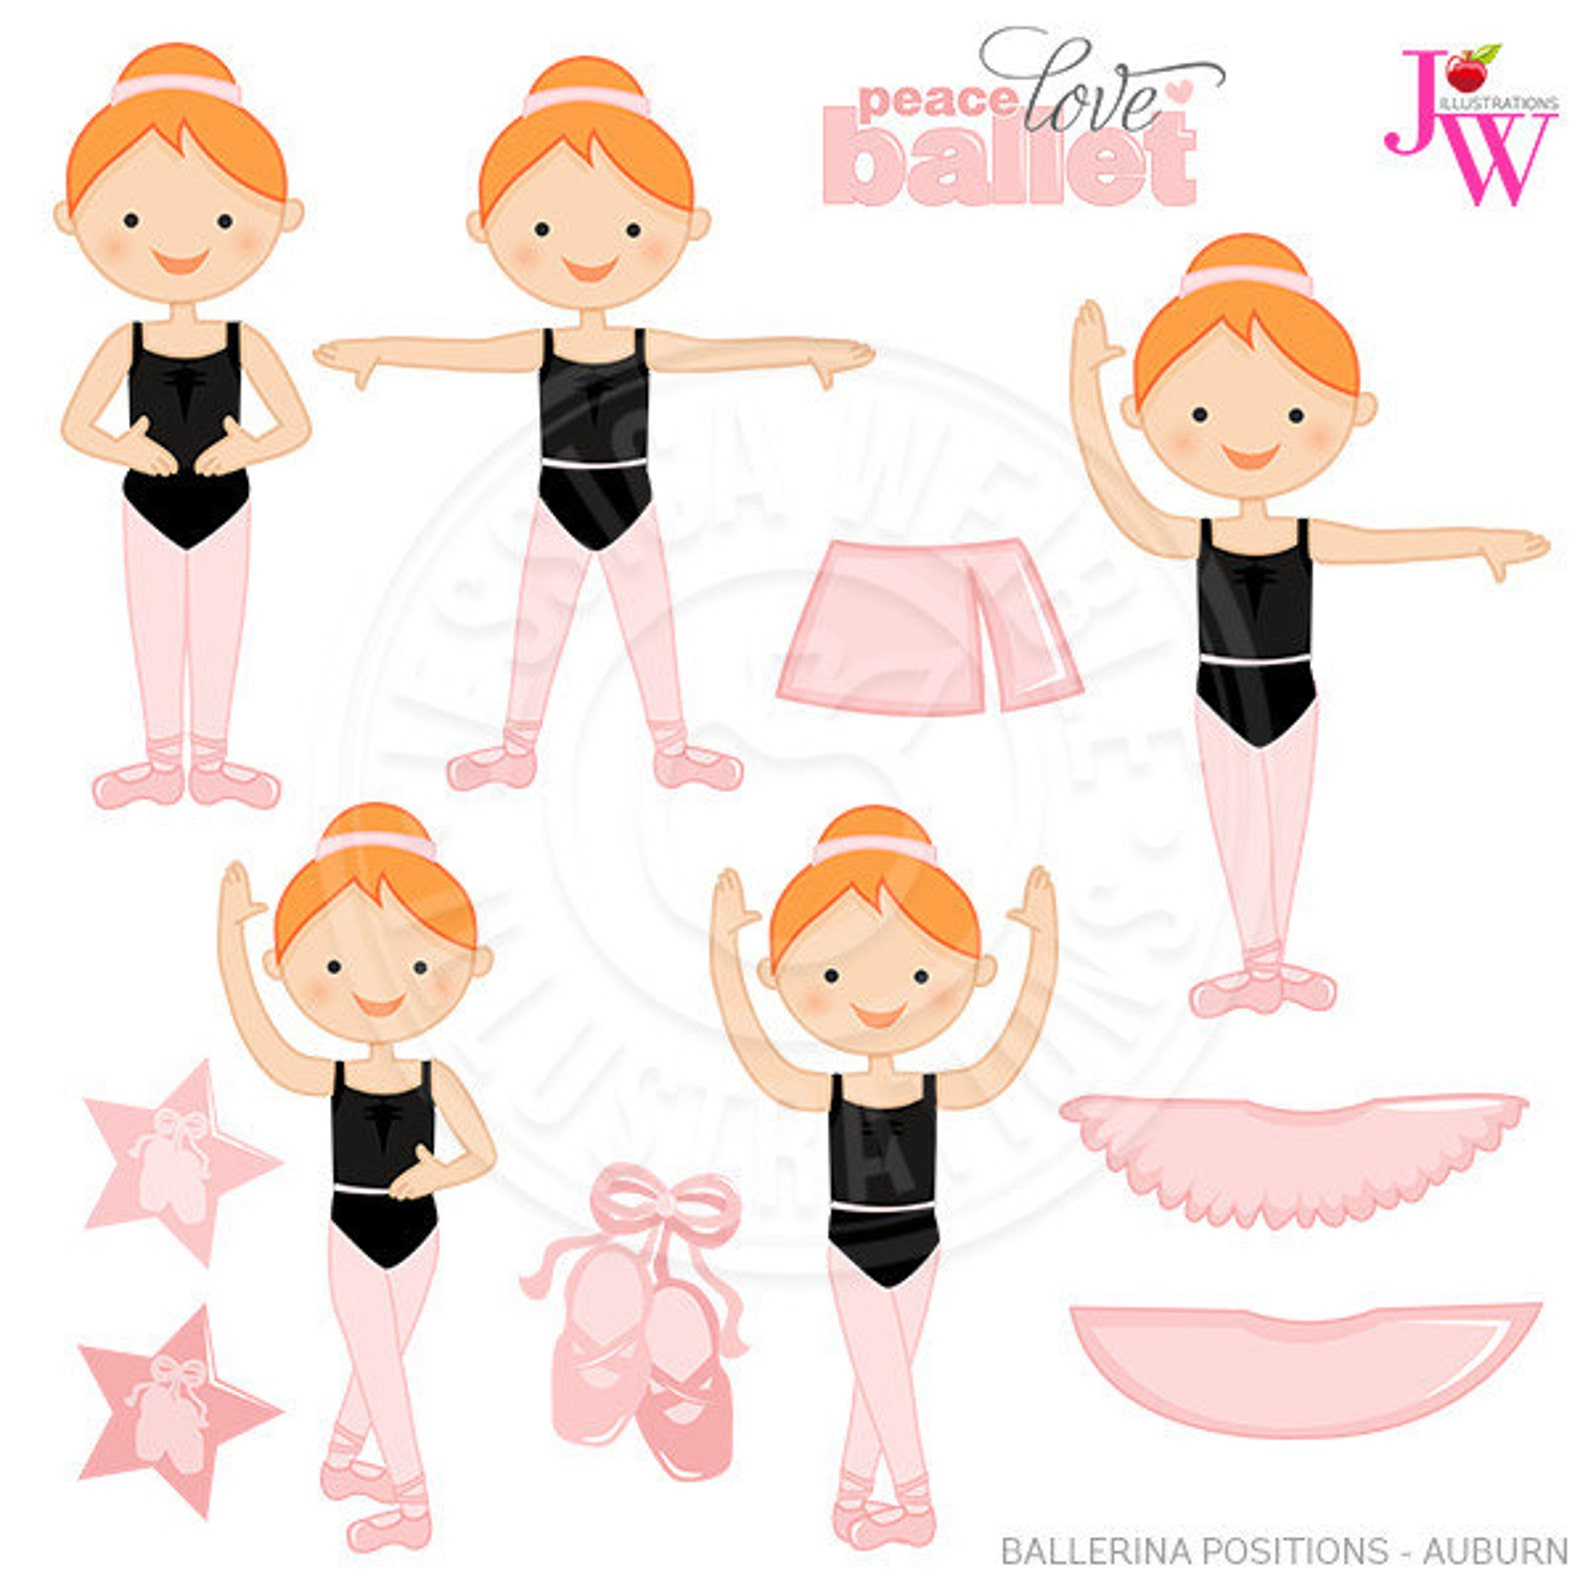 auburn ballerina positions cute digital clipart, ballerina clip art, ballet graphics, ballet positions, instant download, ballet